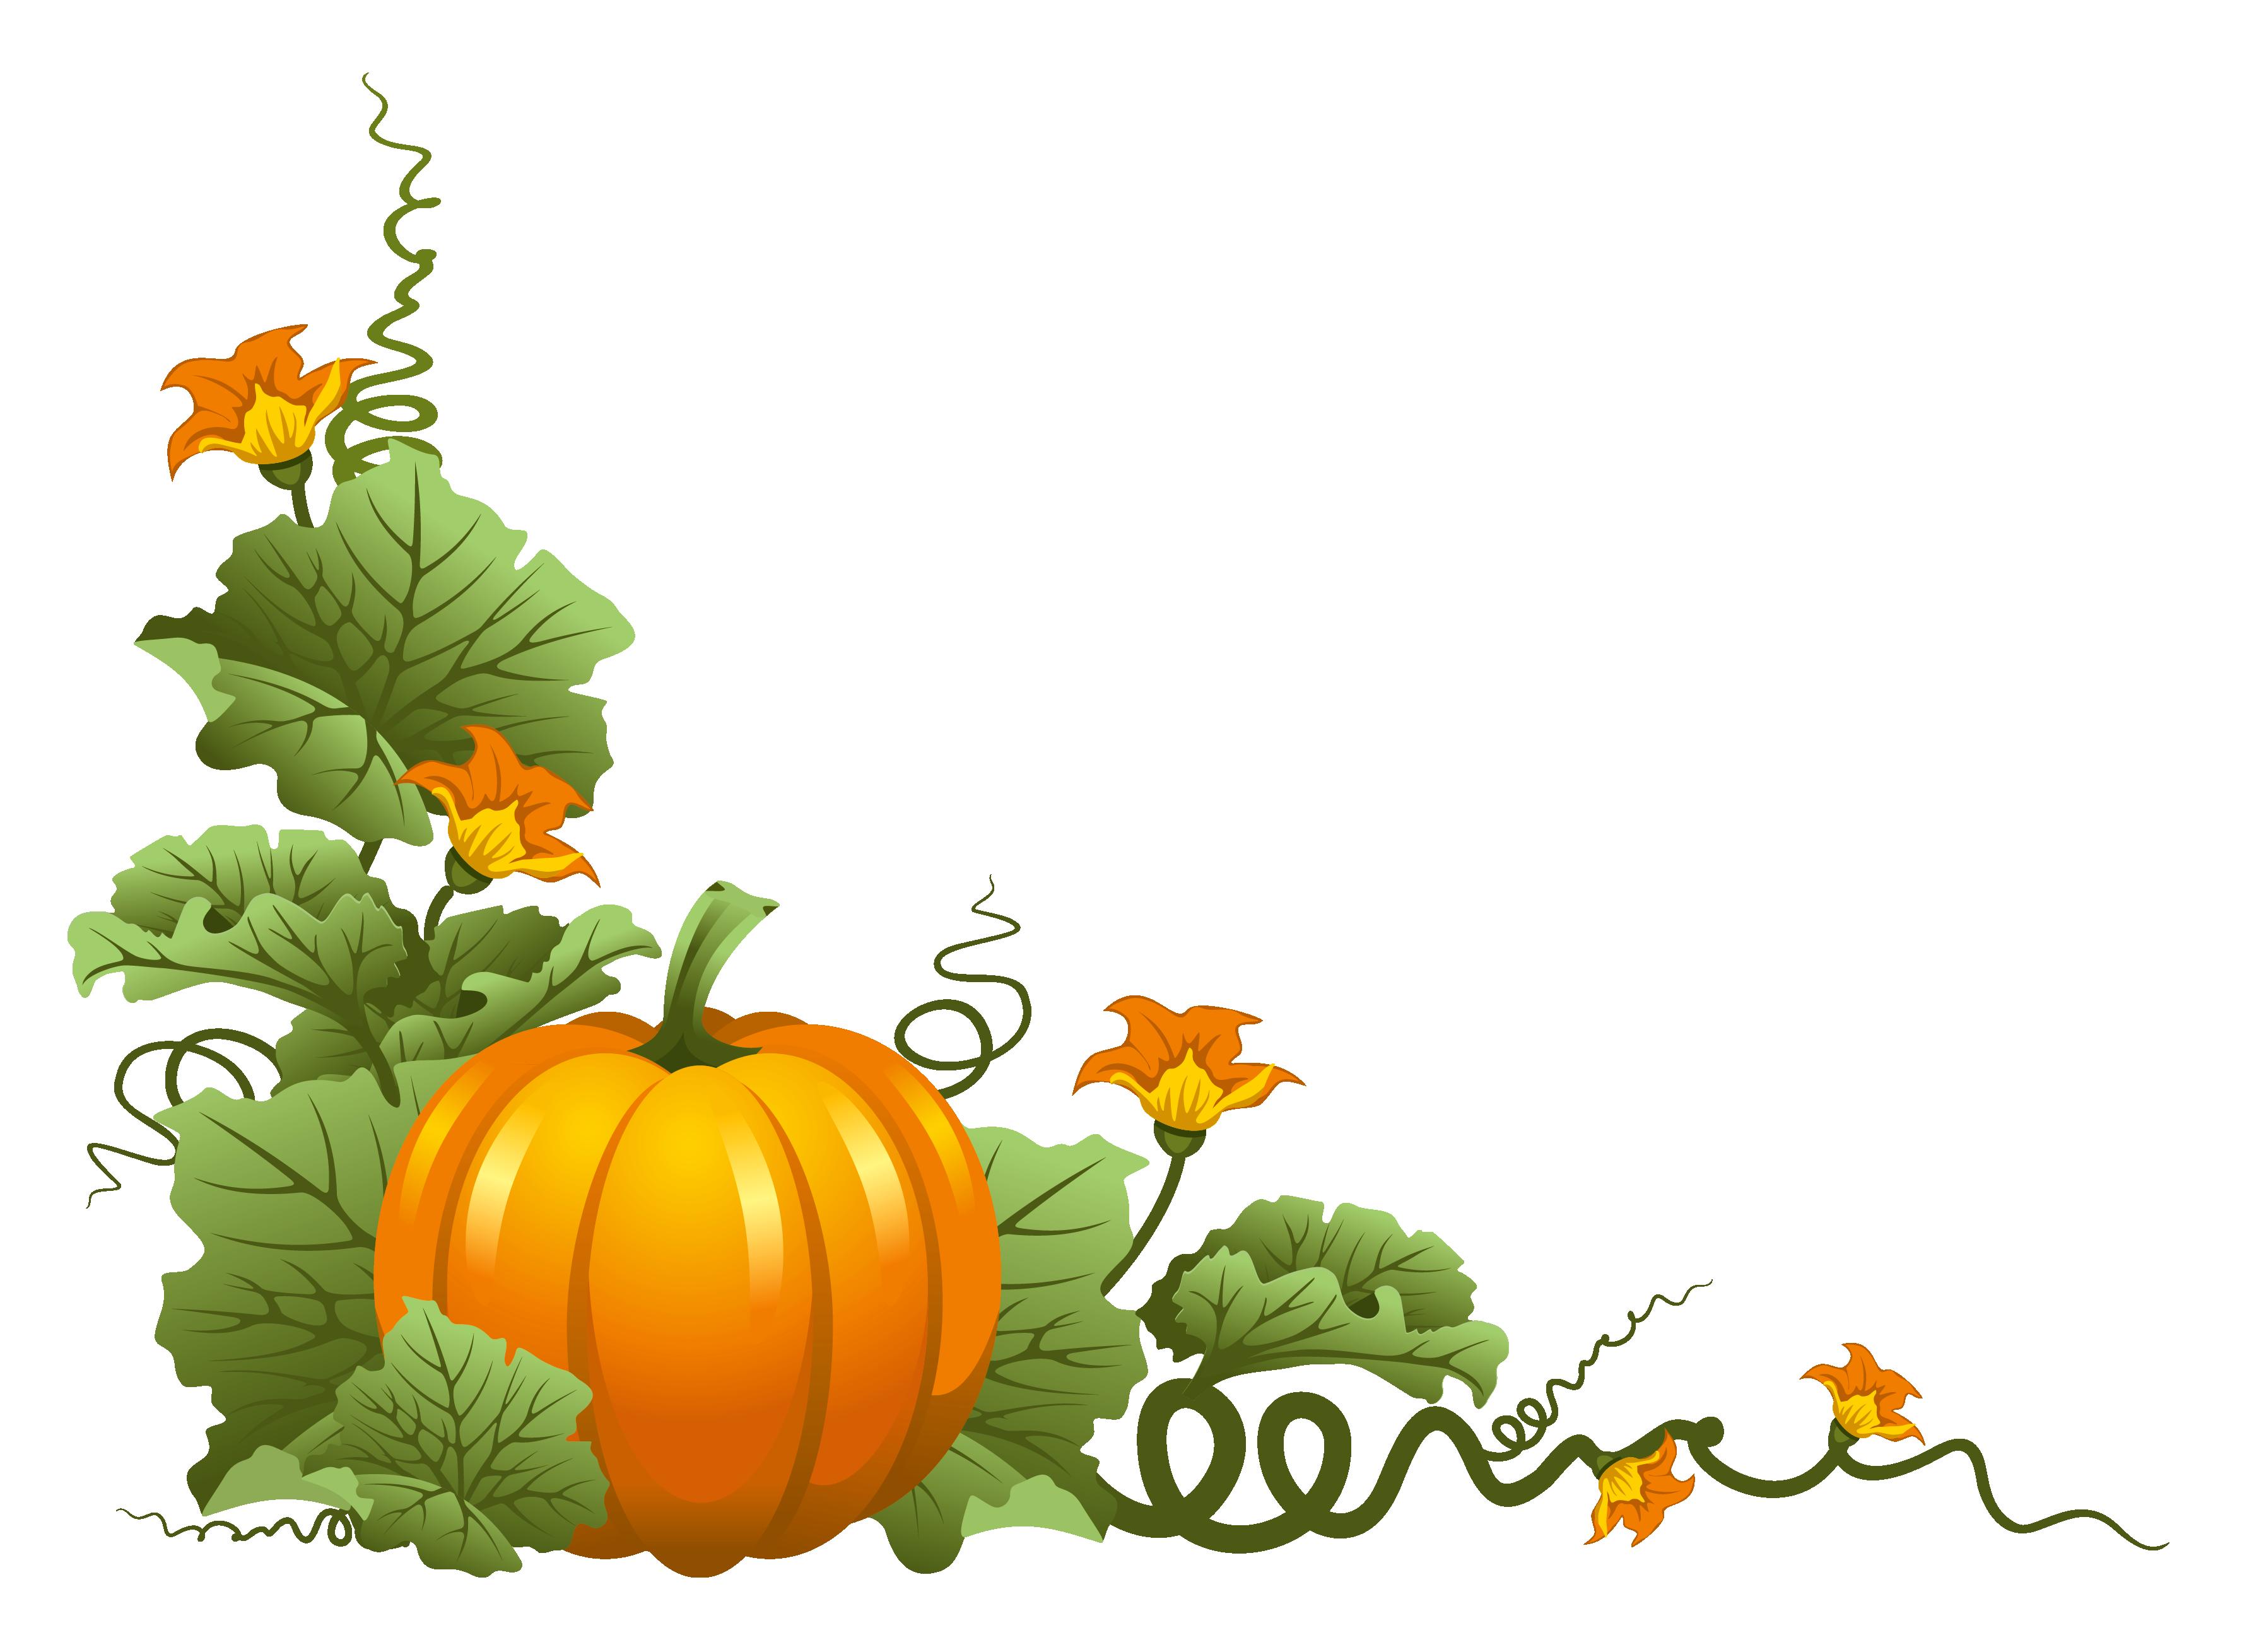 Pumpkin Decor PNG Clipart Ősz